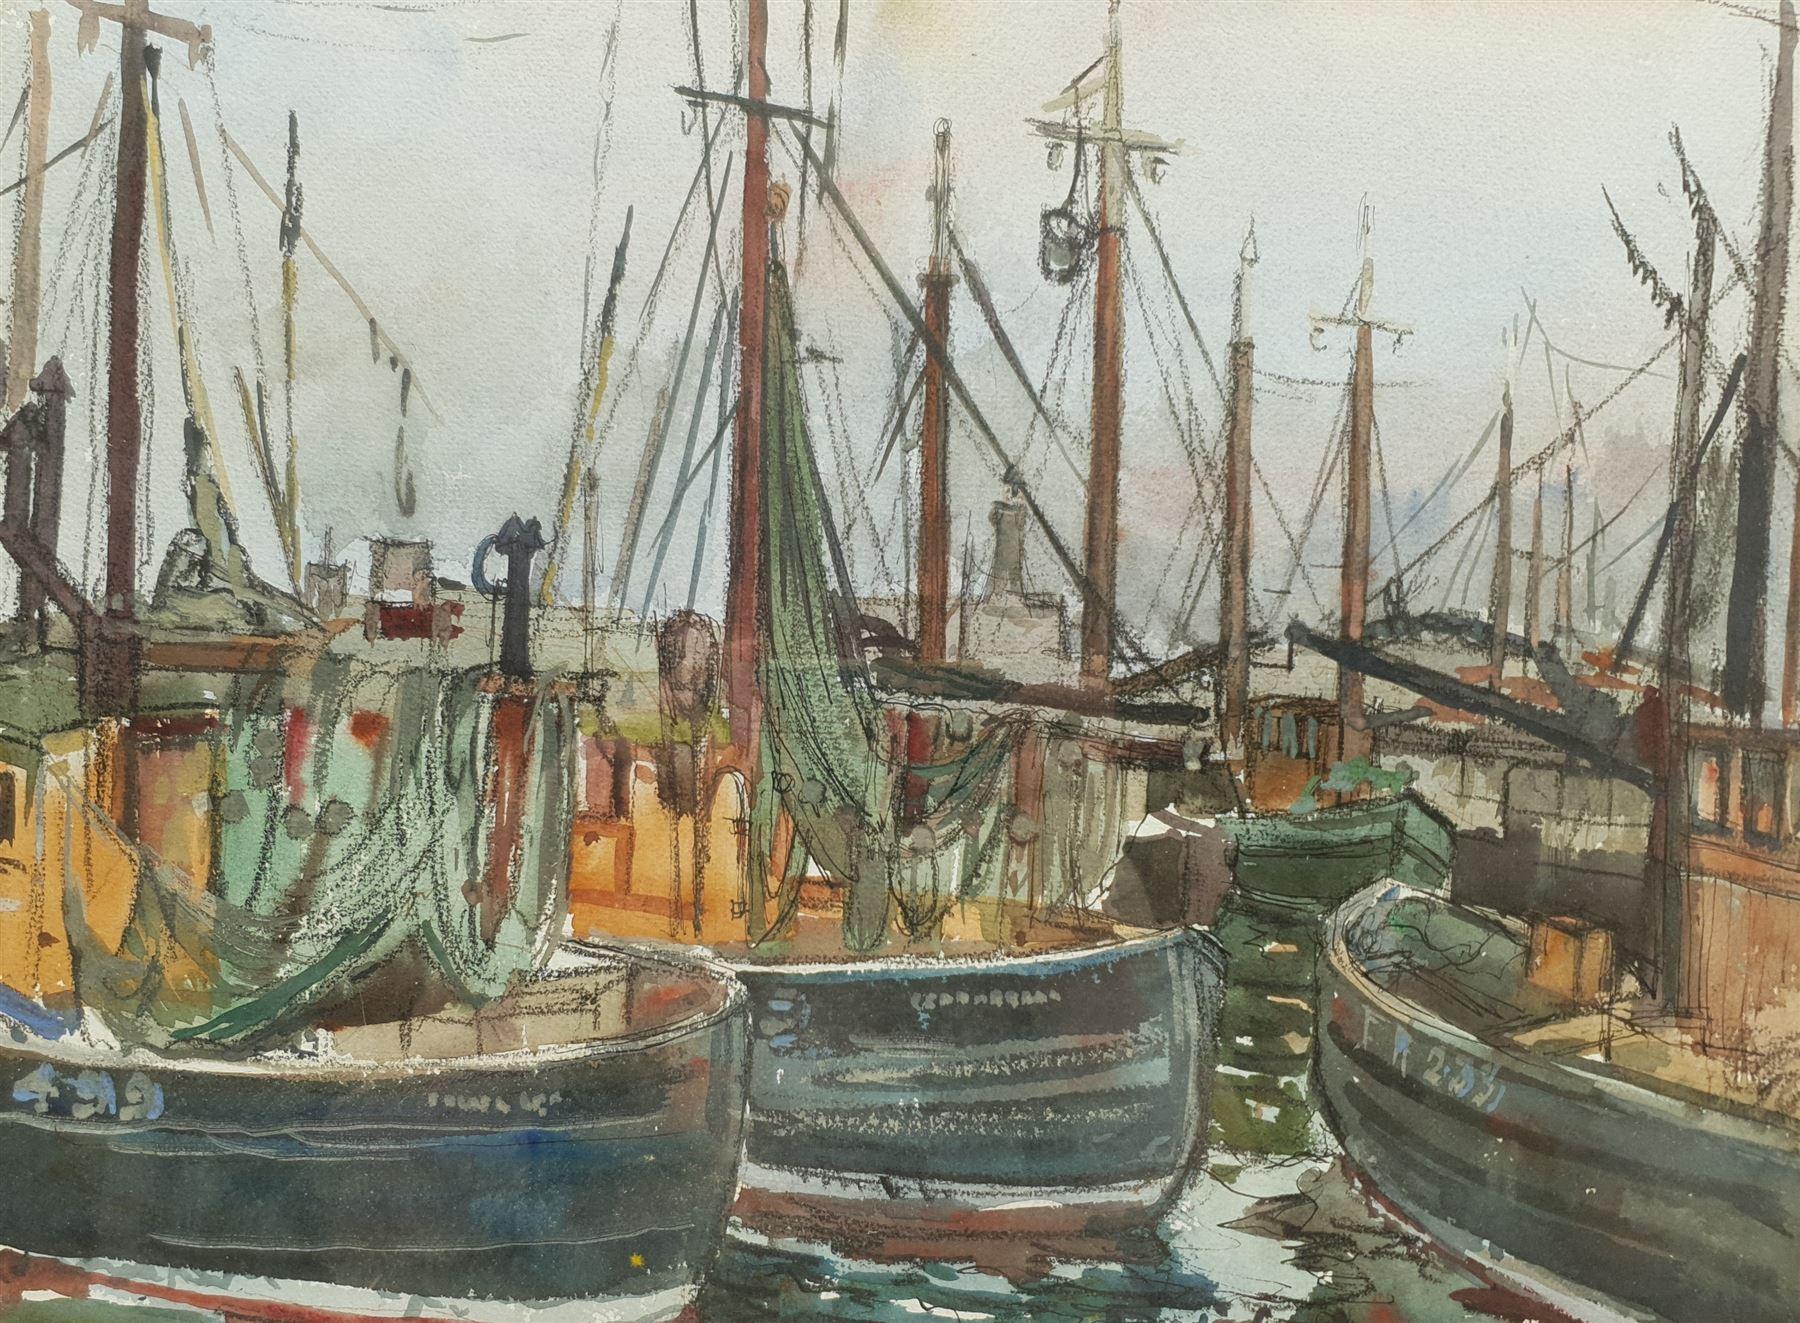 Robert Hardie Condie (Scottish 1898-1981): 'Masts and Nets Fraserburgh'